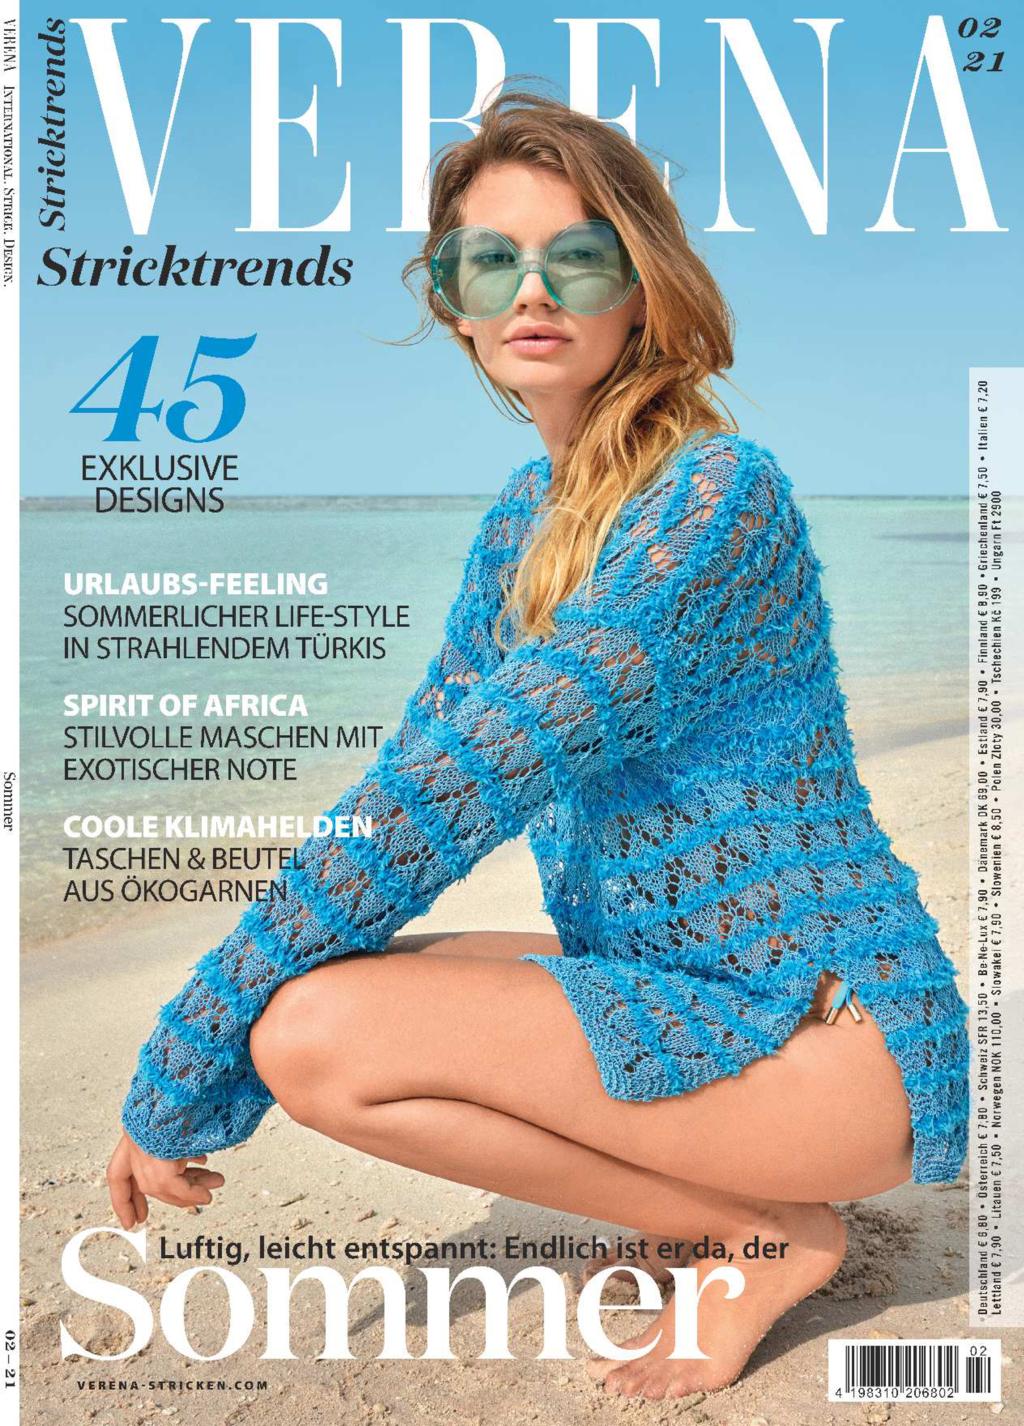 E-Paper: Verena Stricktrends 02/2021 - Sommer!